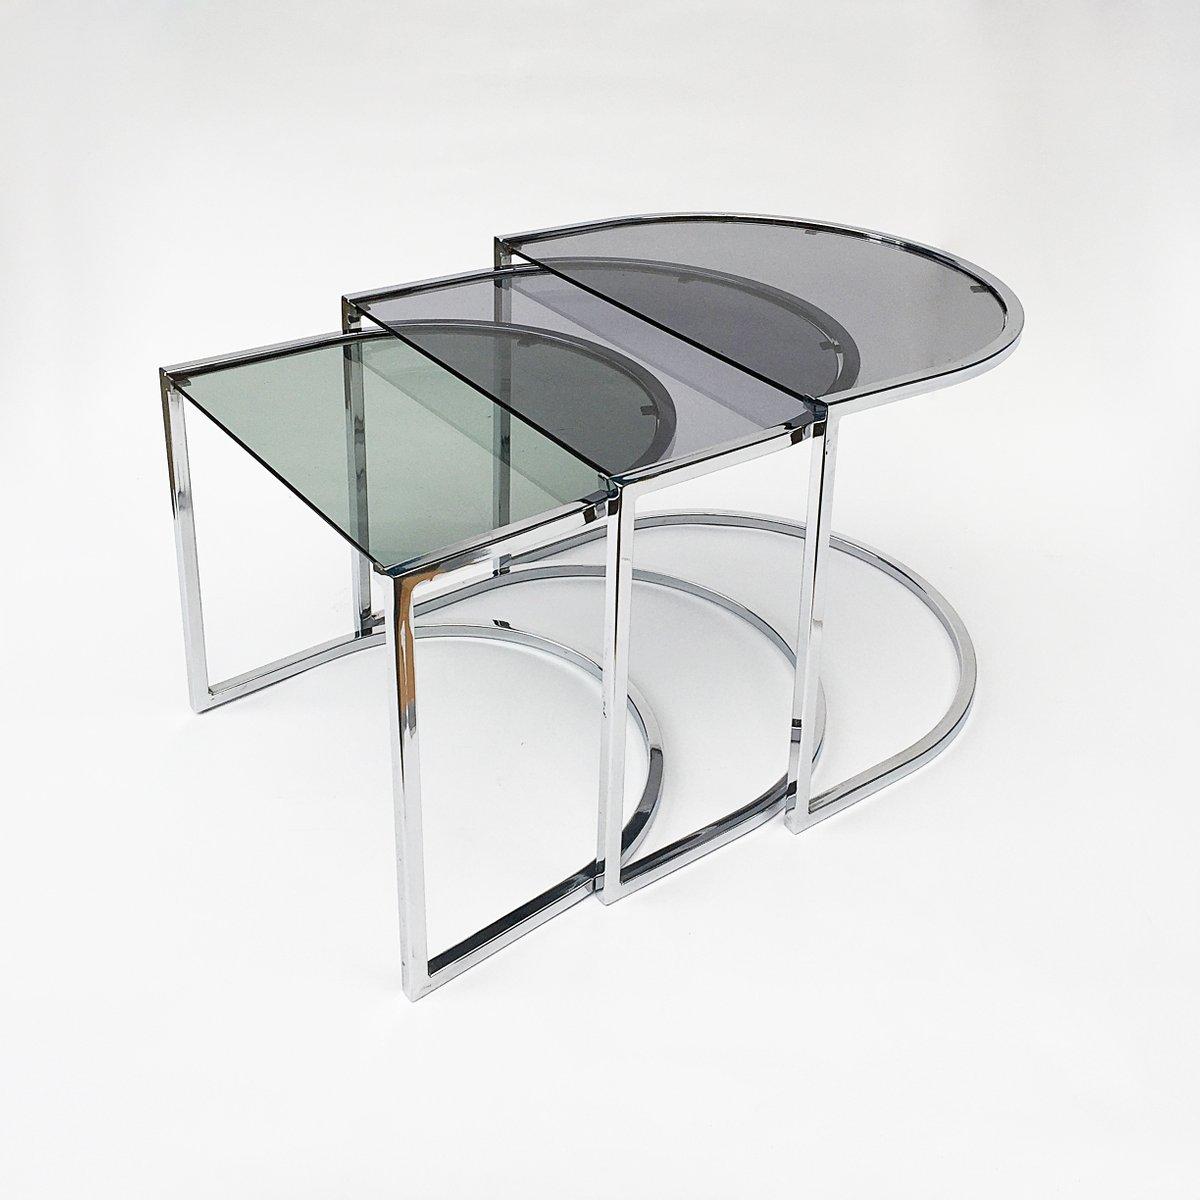 Interesting Tables Set Ideas - Best Image Engine - xnuvo.com